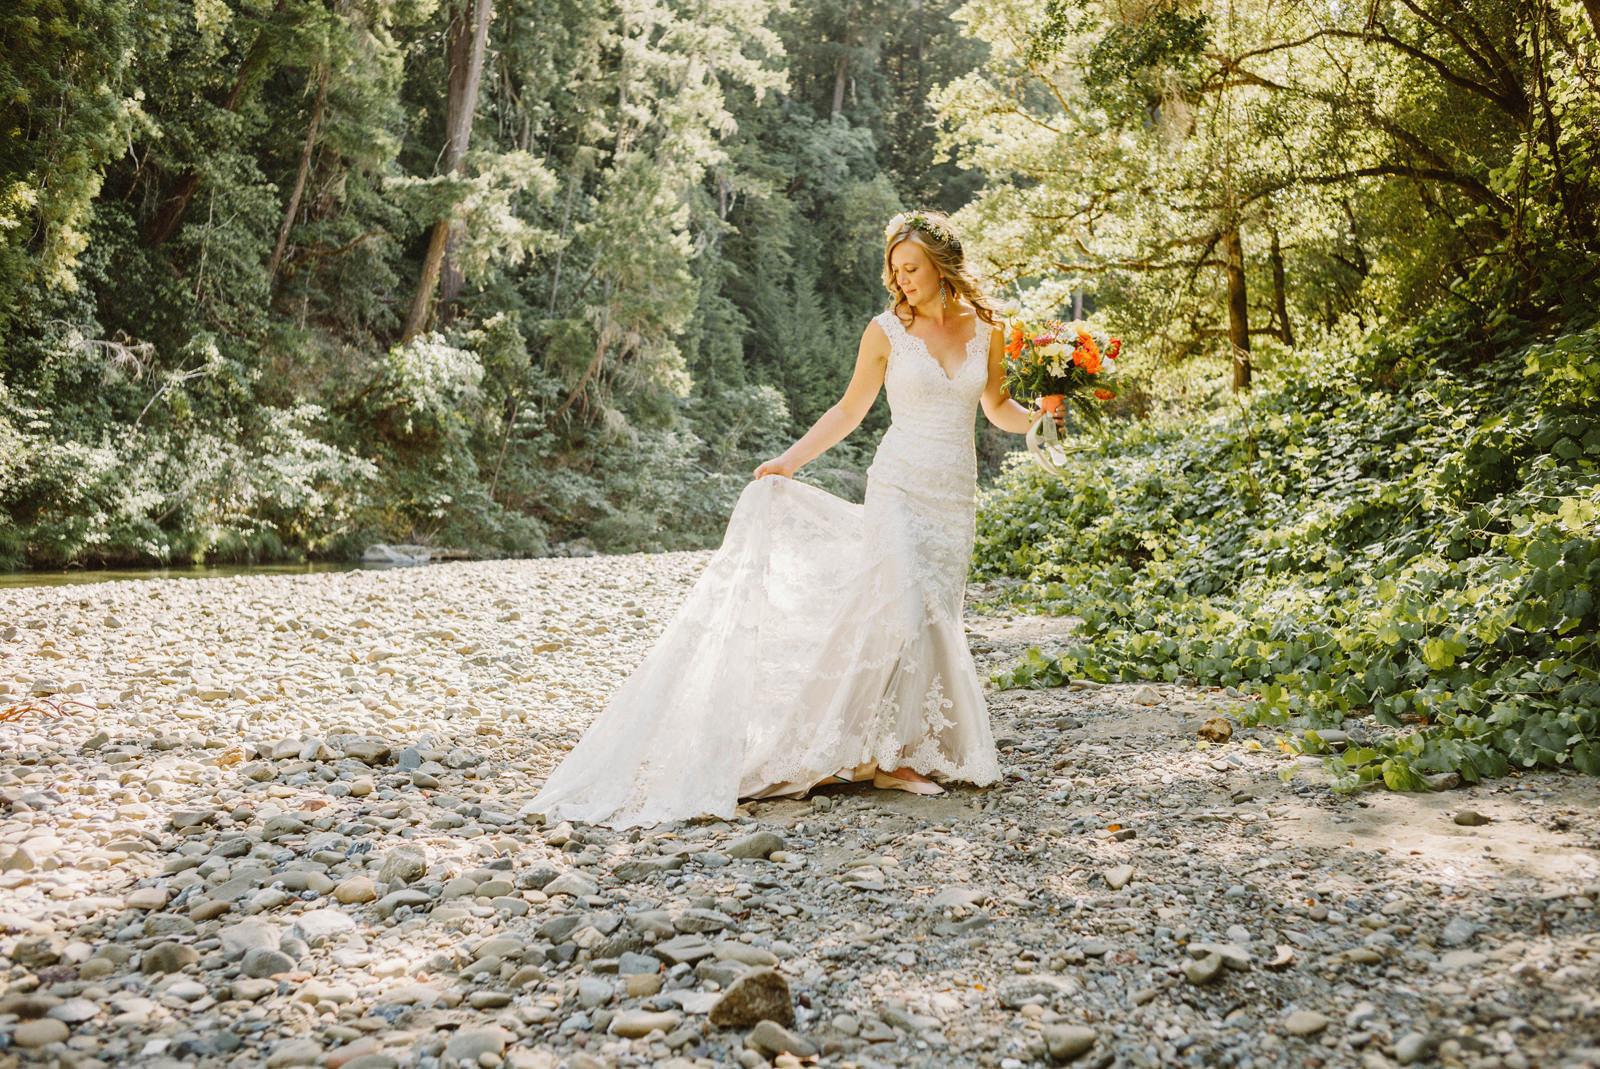 rivers-bend-retreat-wedding-054 RIVER'S BEND RETREAT WEDDING